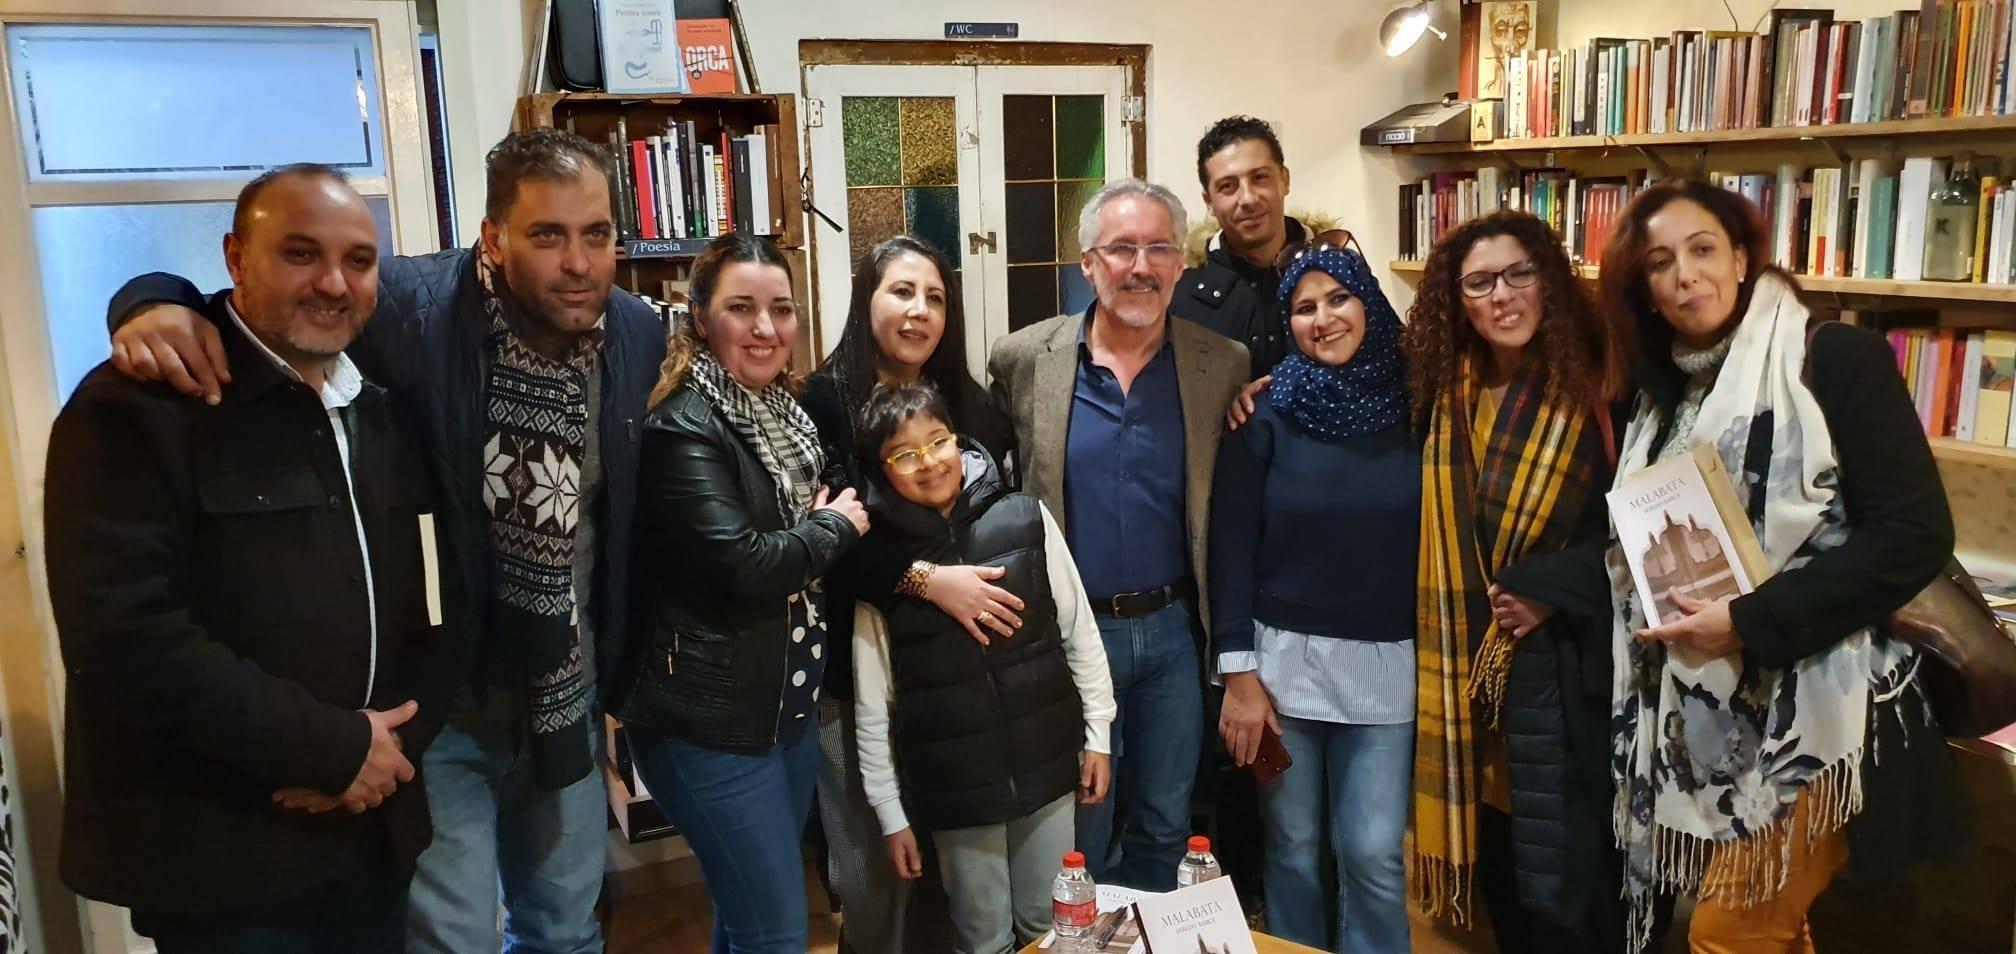 BARNA Abdelmalek Rghioui, Abdelkader Maghnaz, Hanane, Farah Bensalah, Fatima Zahra el Harrak, Fatima Amrani, Bouchra y Mohamed detrás